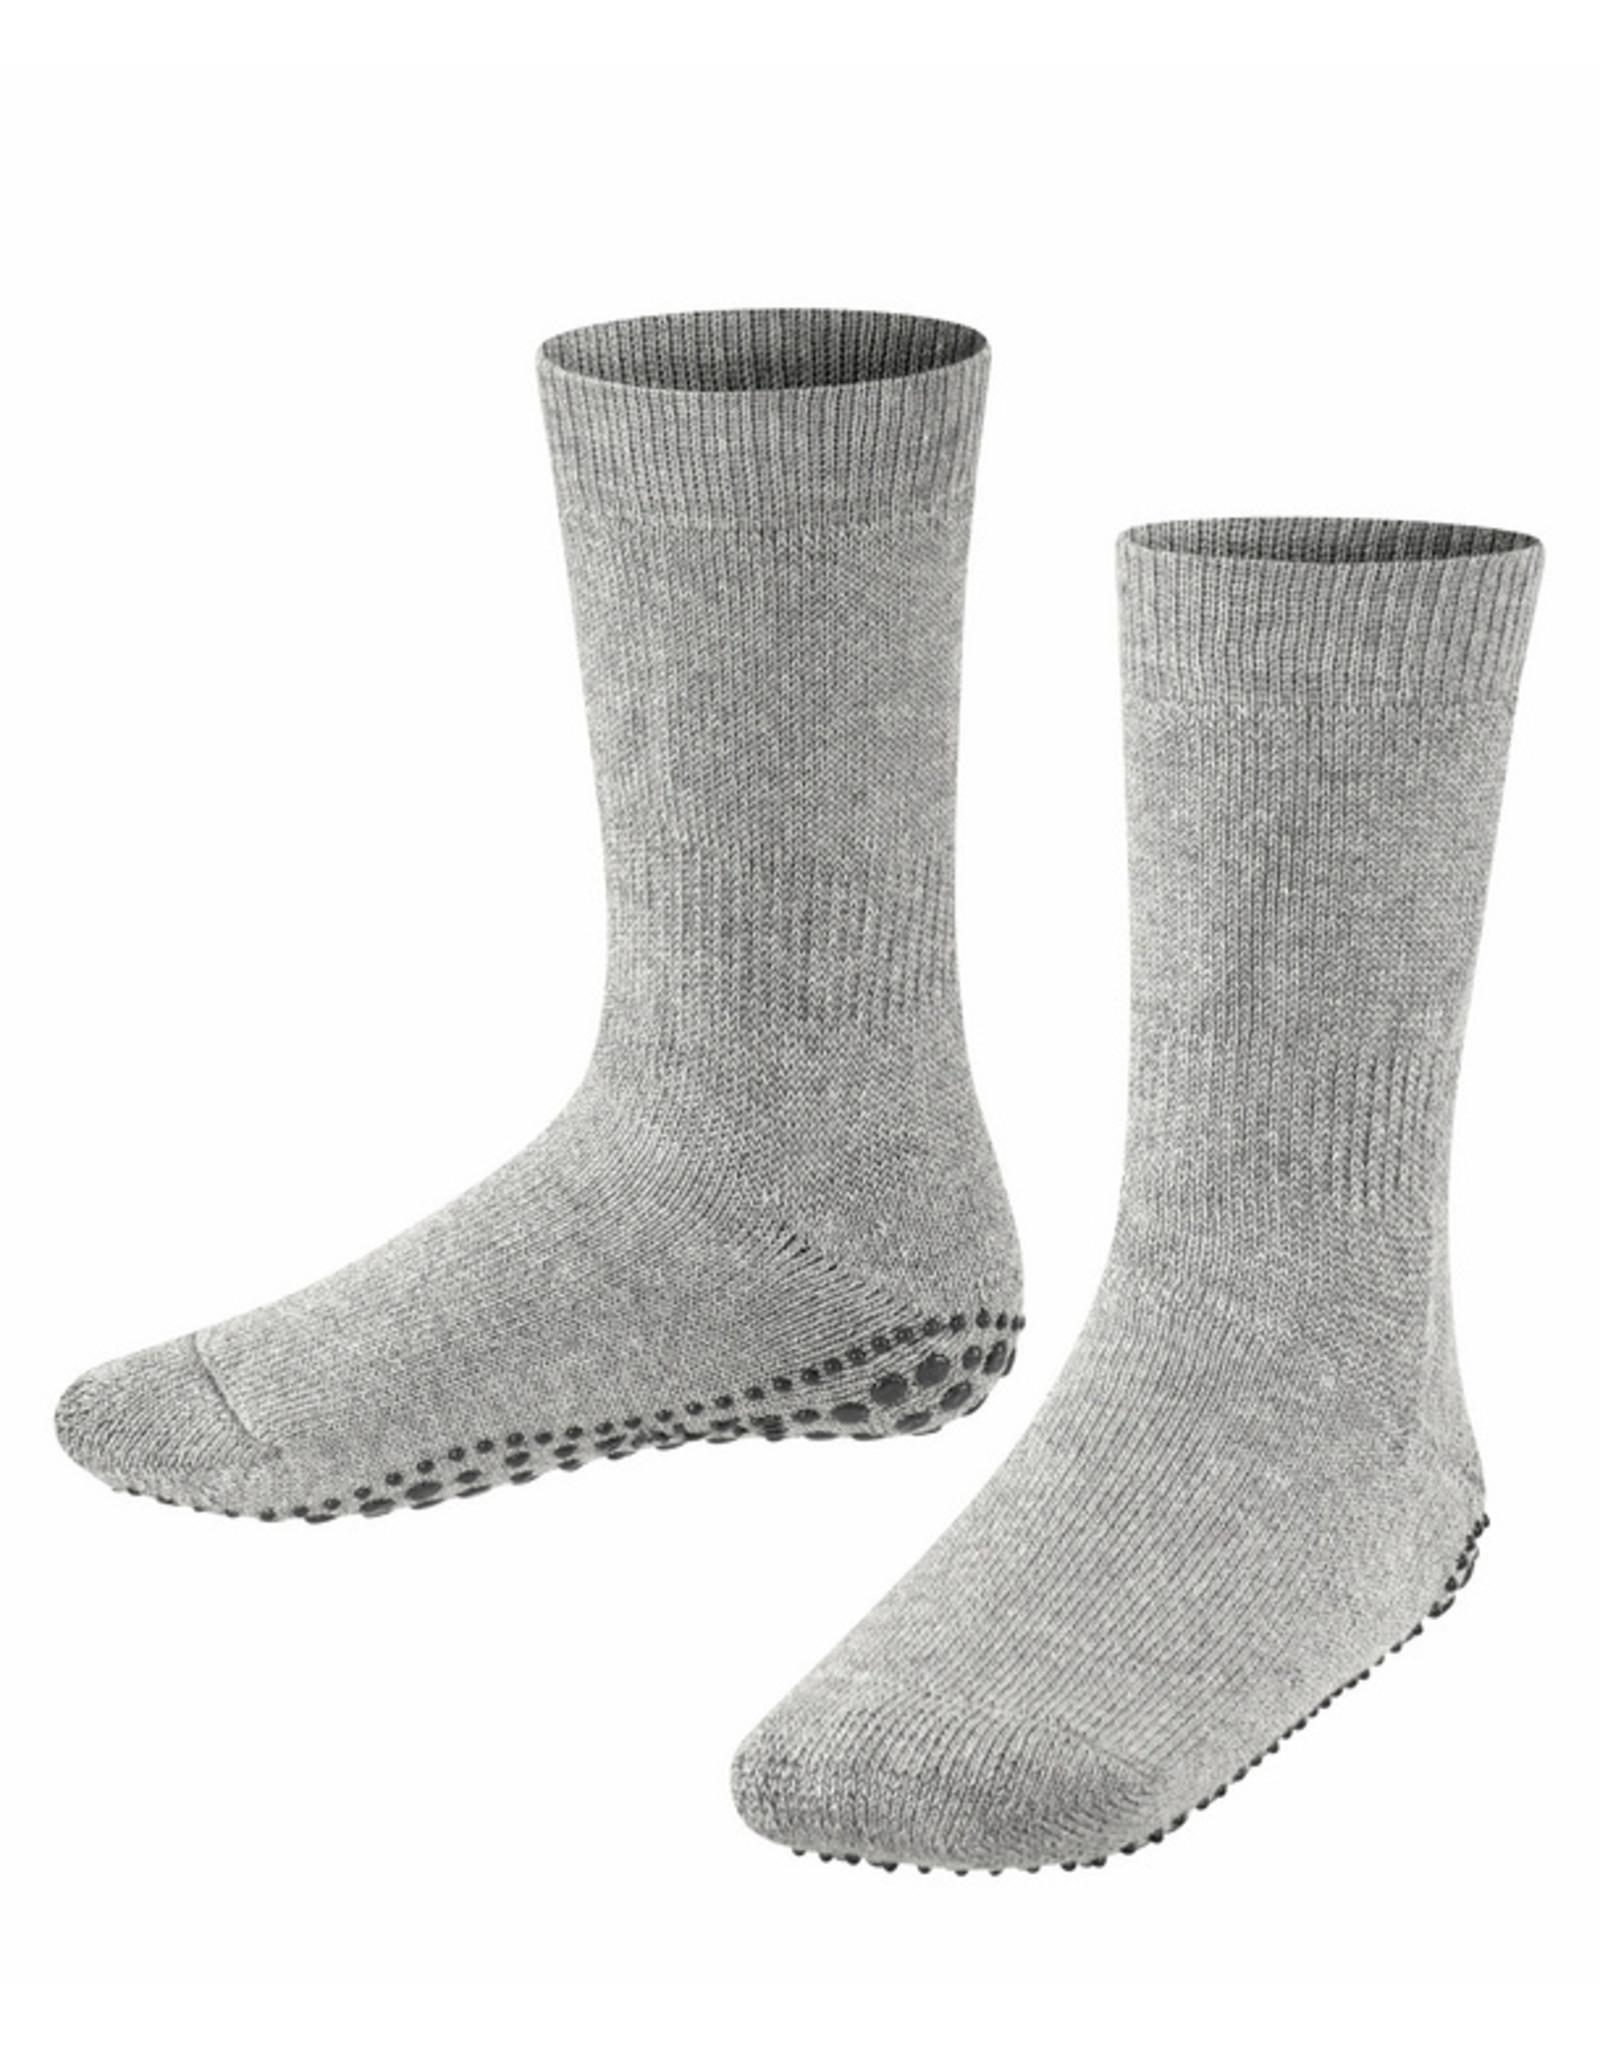 Falke Falke anti-slip huissloffen grijs